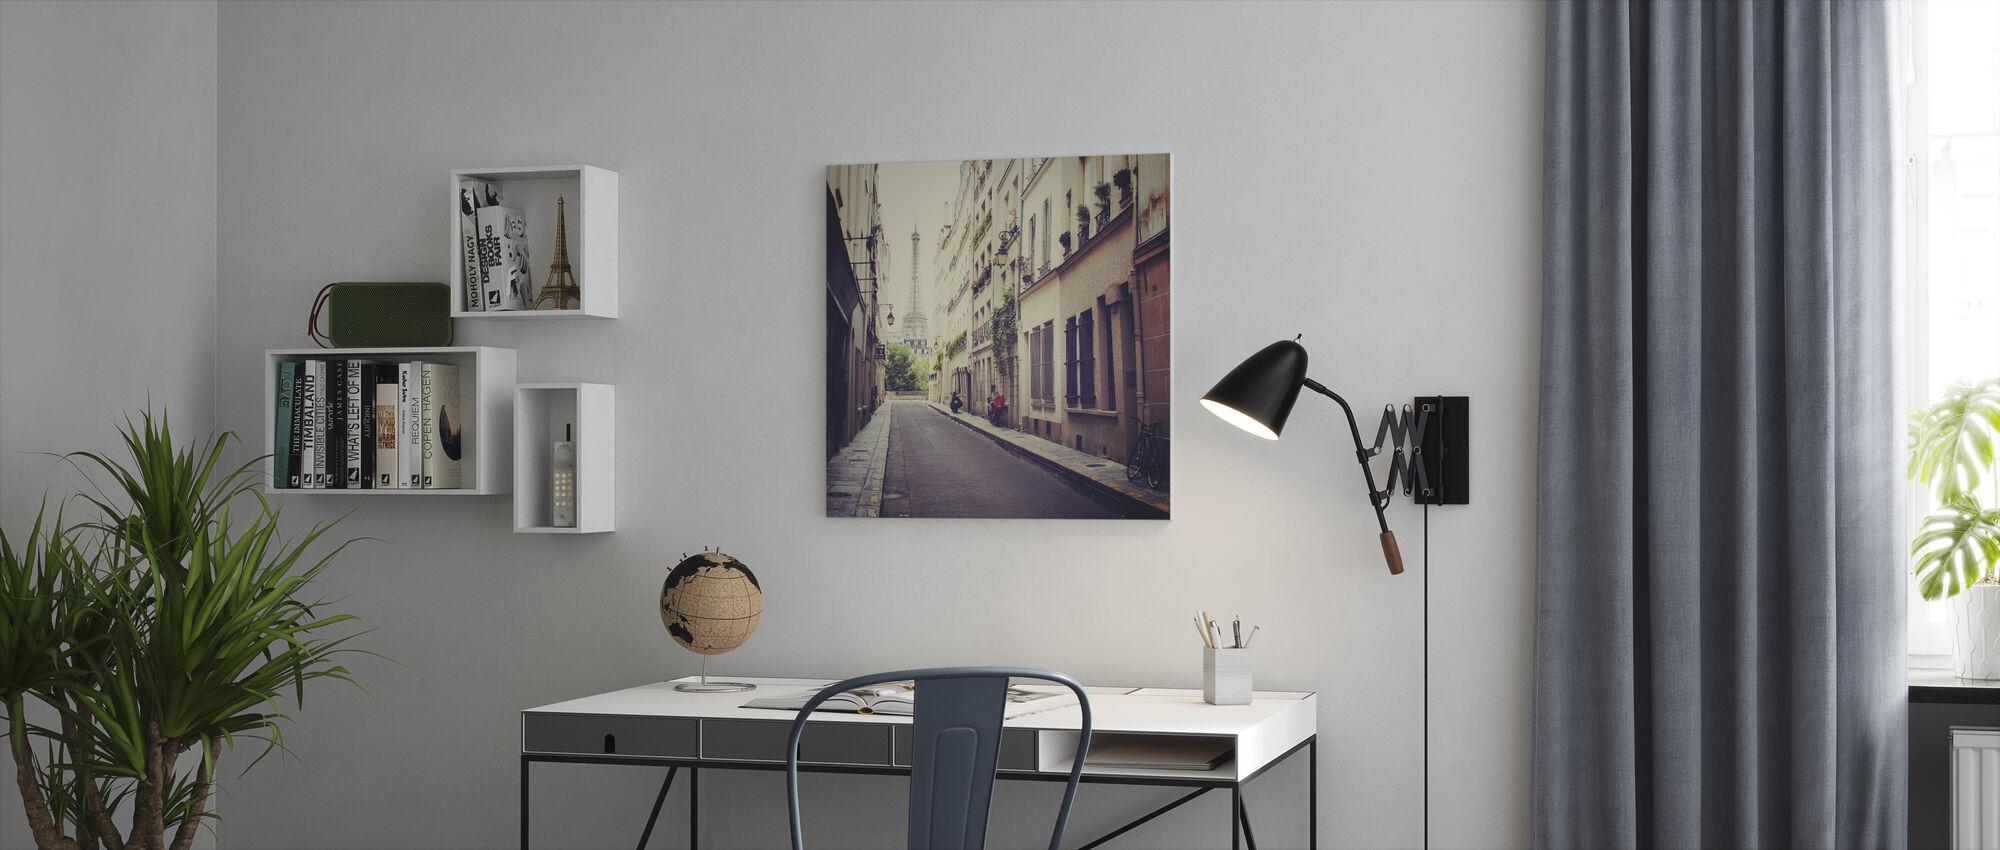 Eiffel Tower - Canvas print - Office